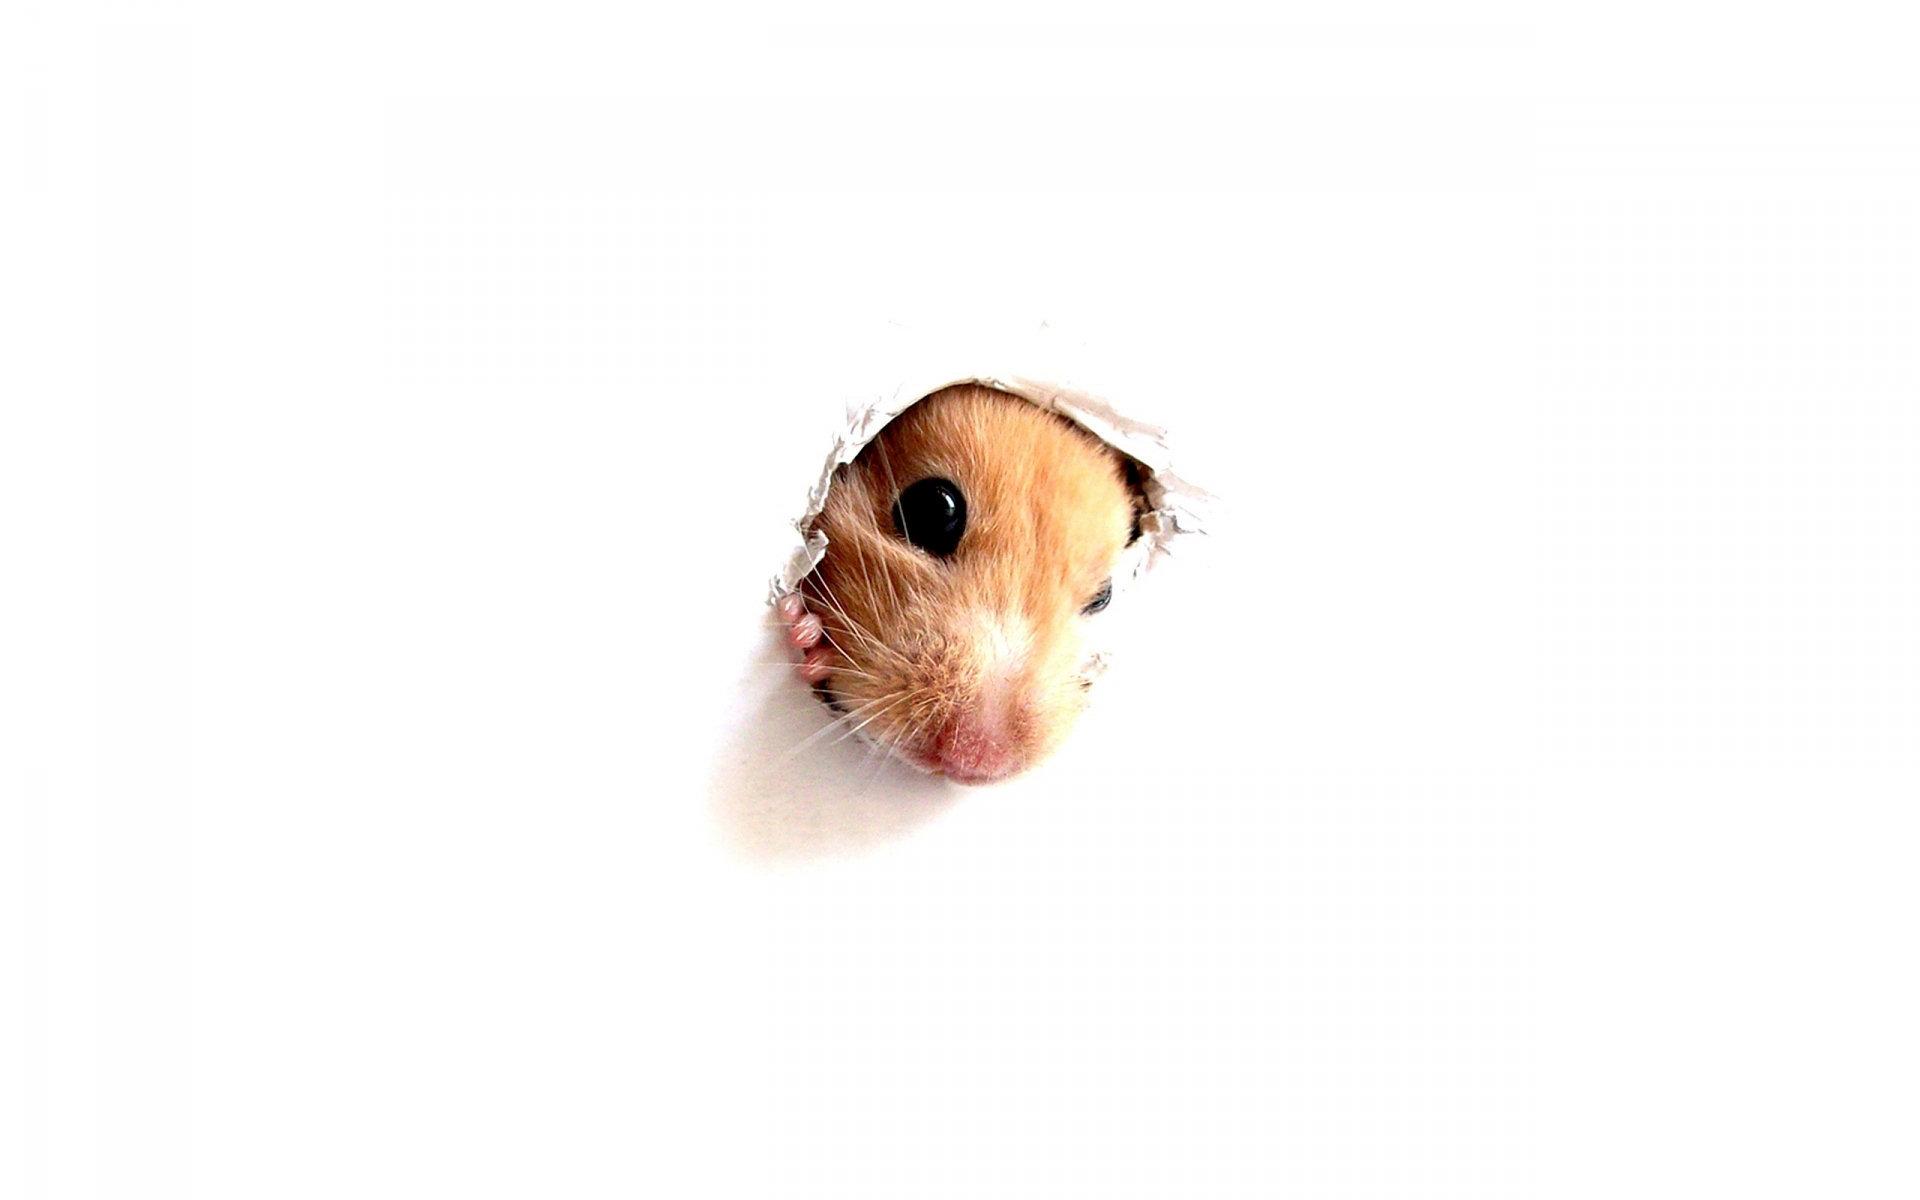 Hamster Wallpapers Hd